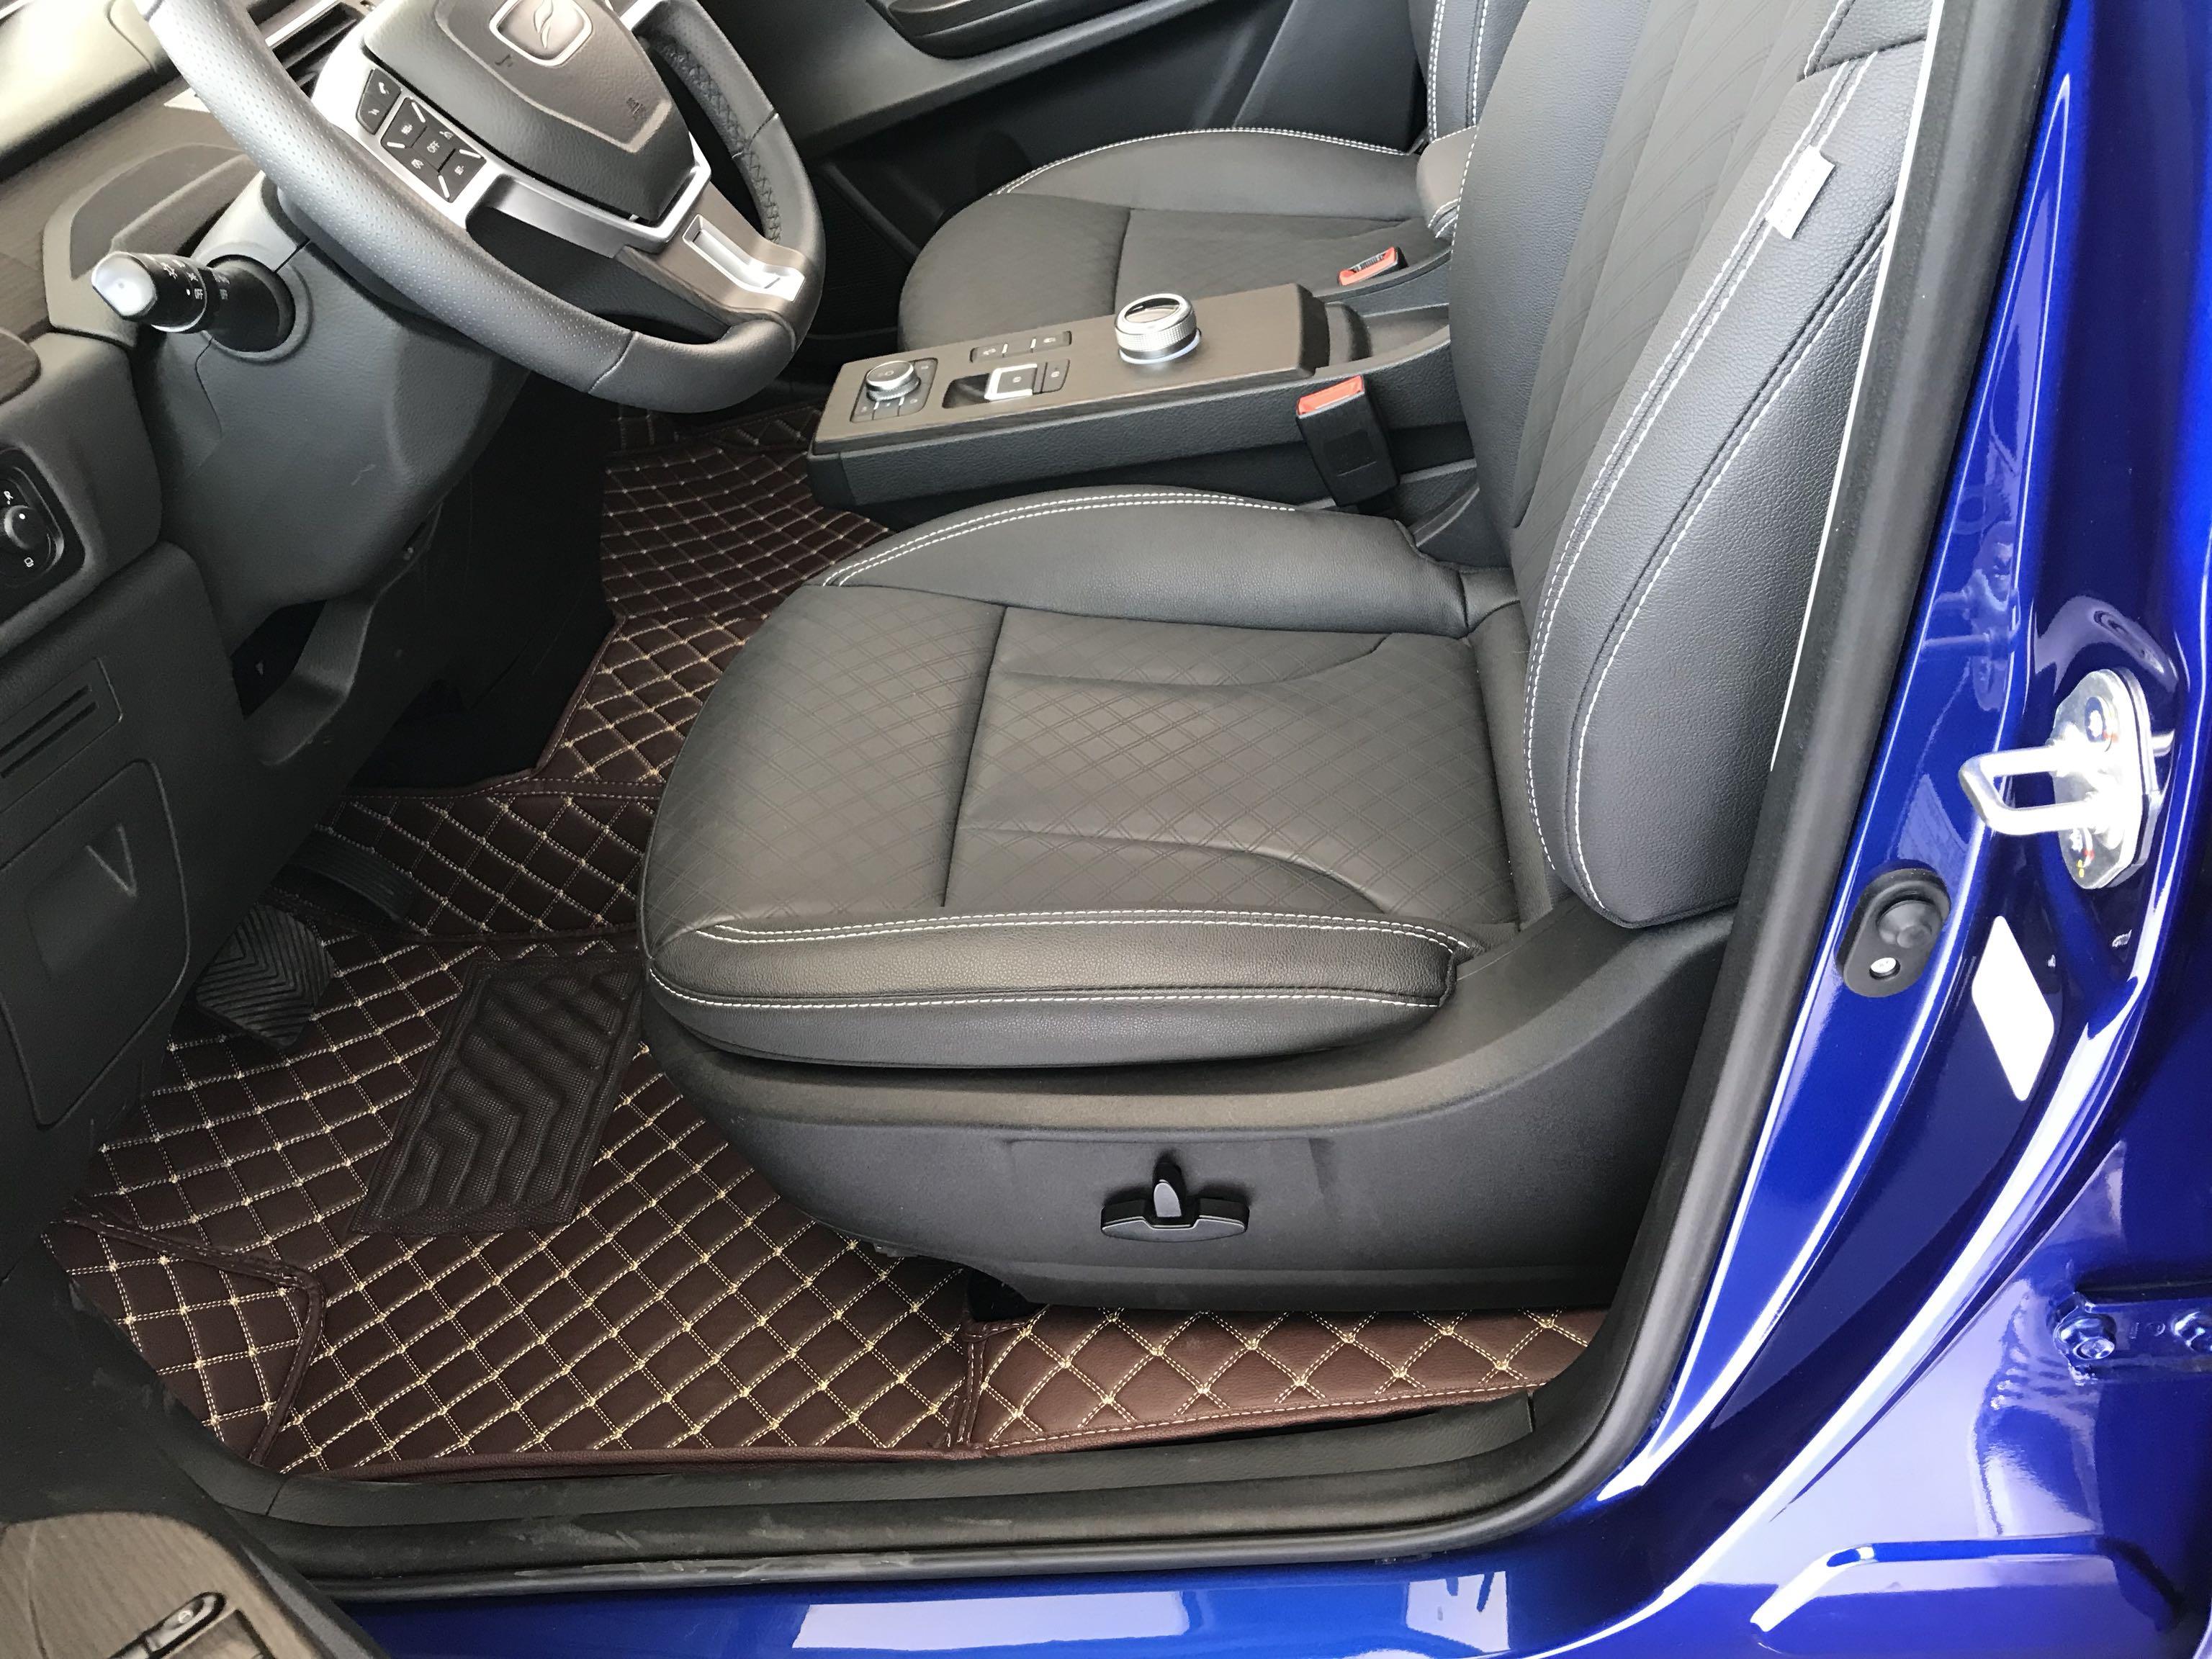 No Odor All Surrounded Waterproof Durable Rugs Custom Car Floor Mats For Cadillac CT6 XTS XT5 SLS CTS ATS ESCALADE SRX XLR